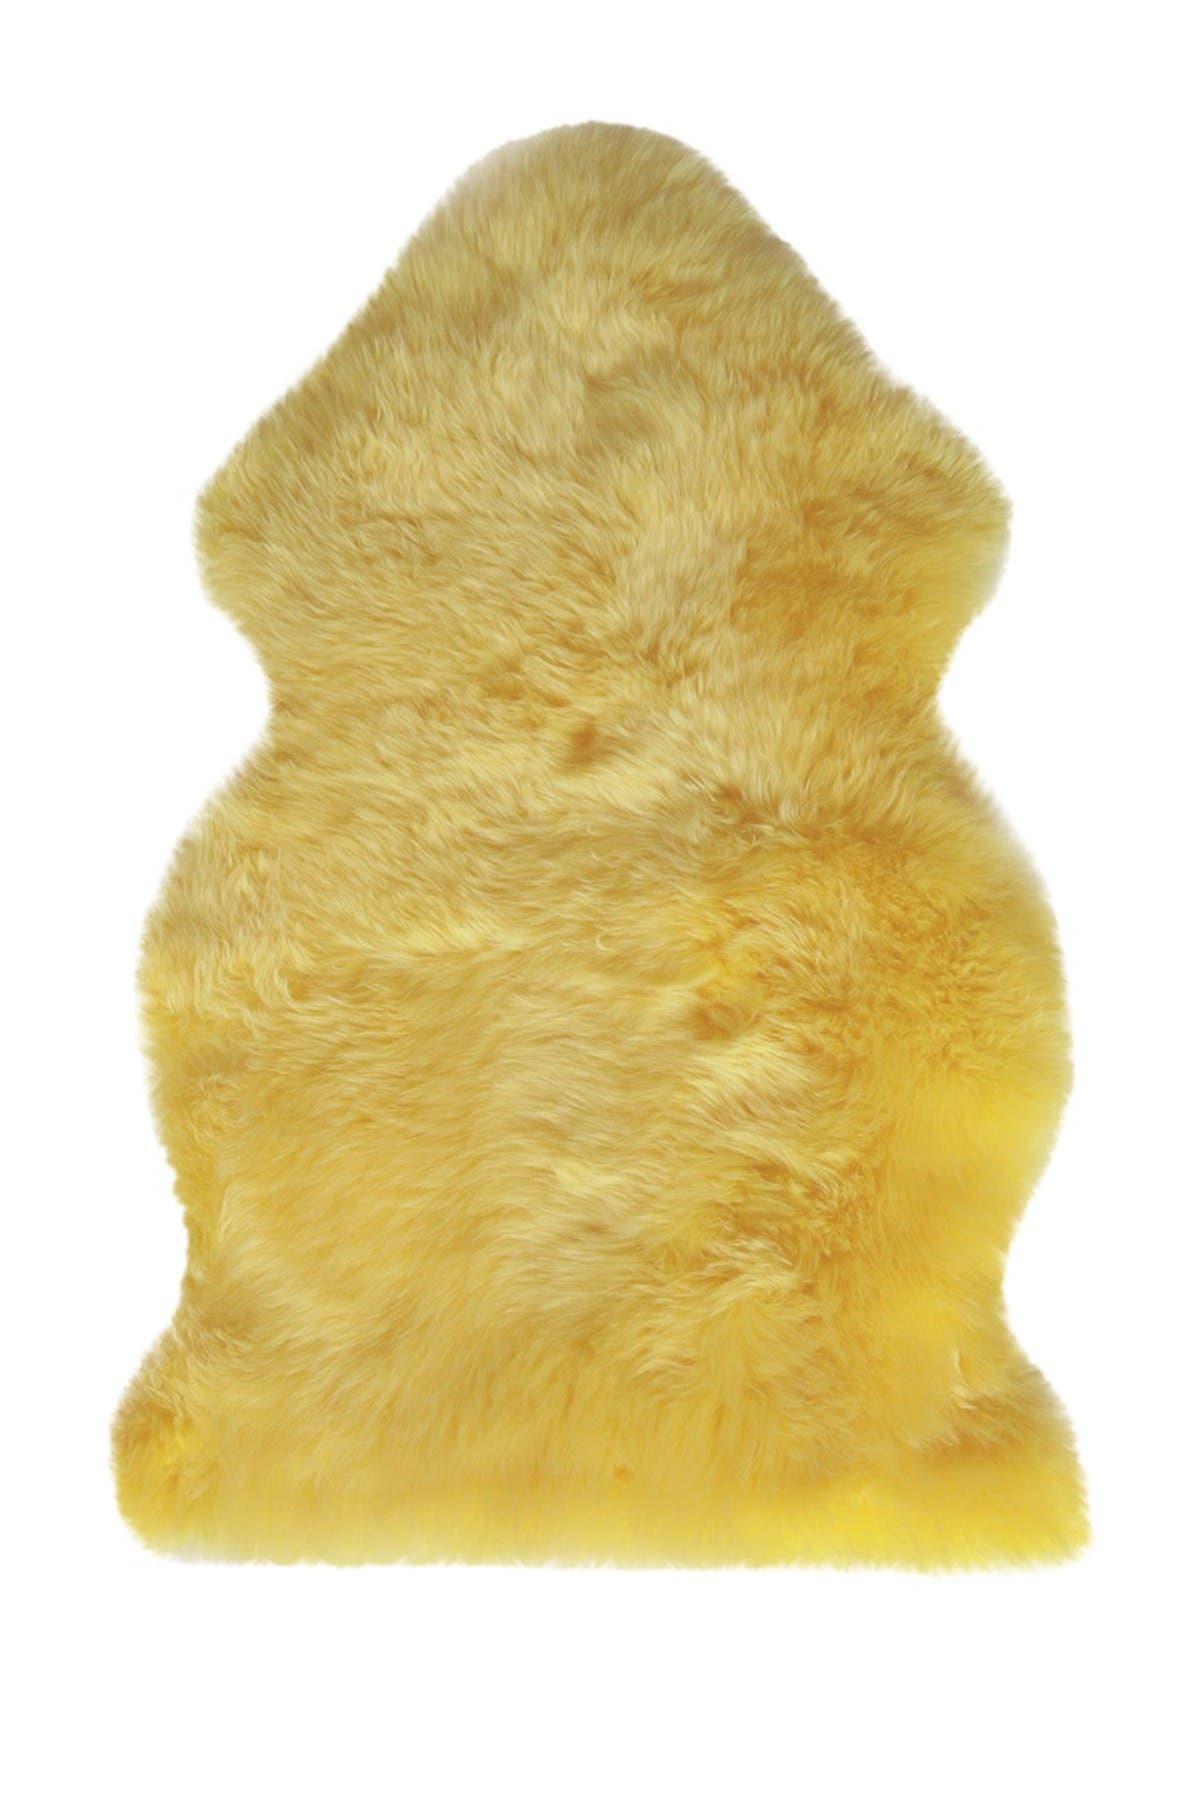 Image of Natural Milan Genuine Sheep Shearling Single Sheepskin Rug - 2ft x 3ft - Canary